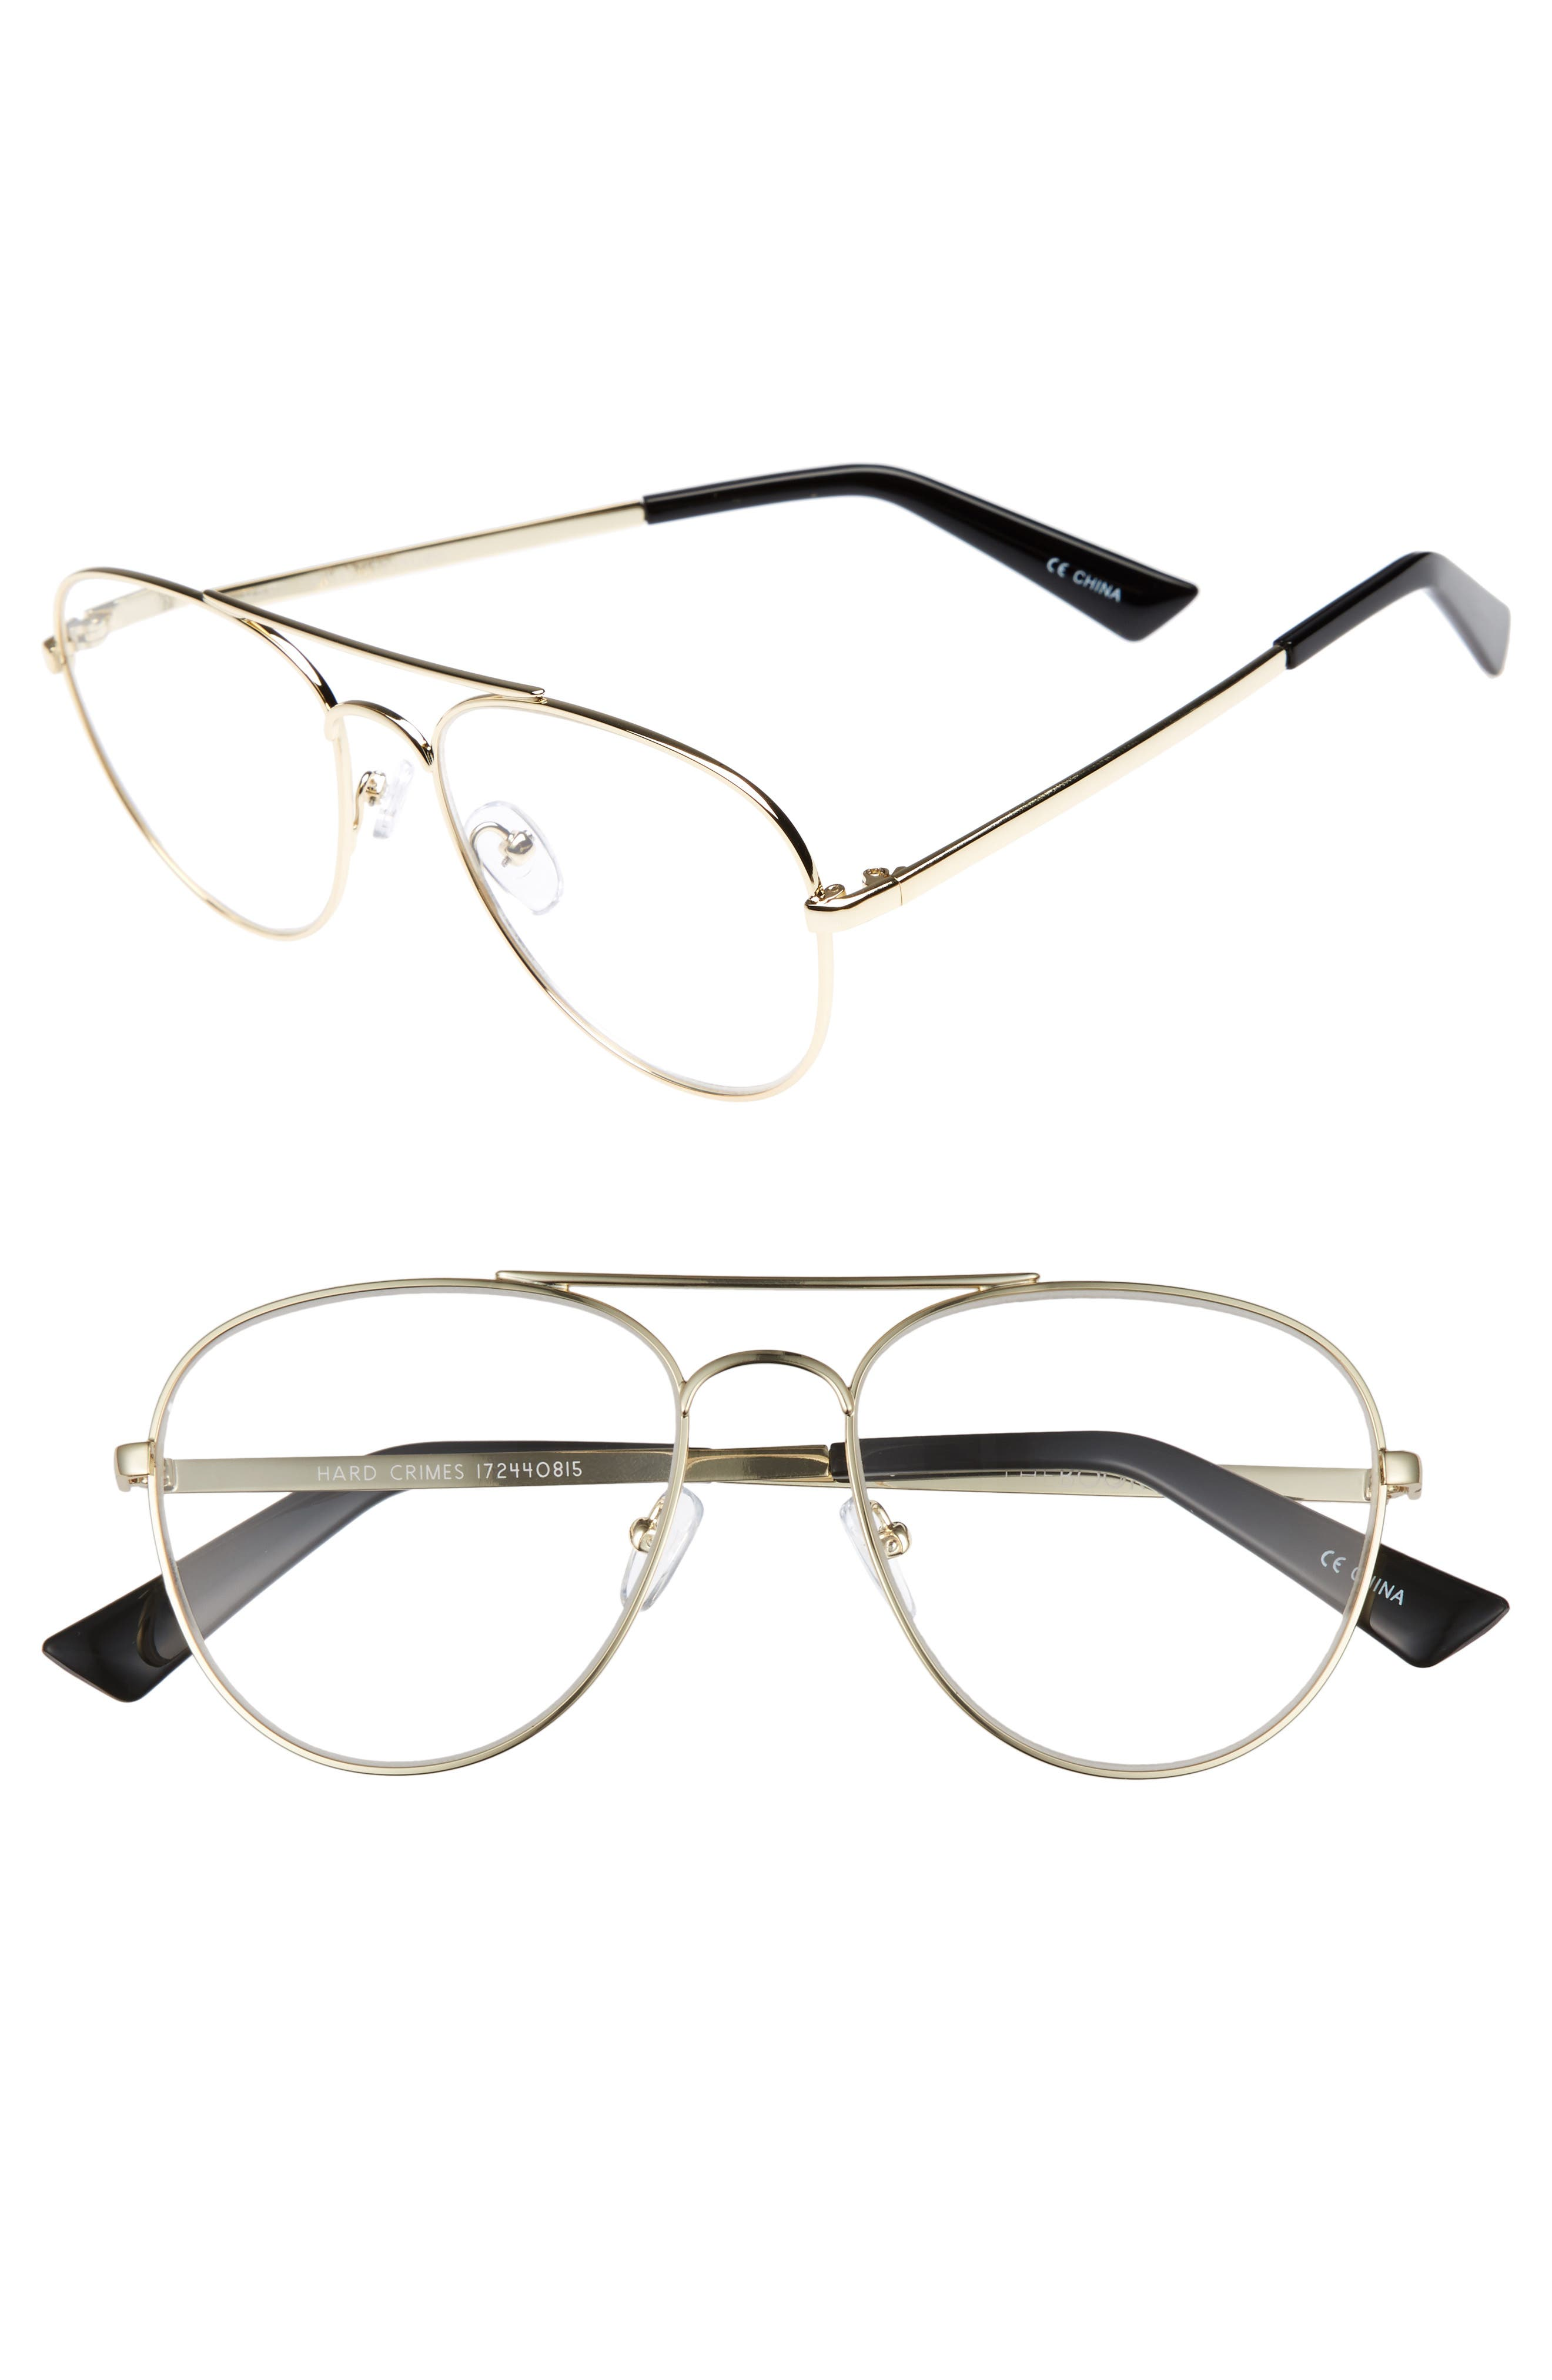 Hard Crimes 55mm Aviator Reading Glasses,                         Main,                         color, Gold/ Black Marker